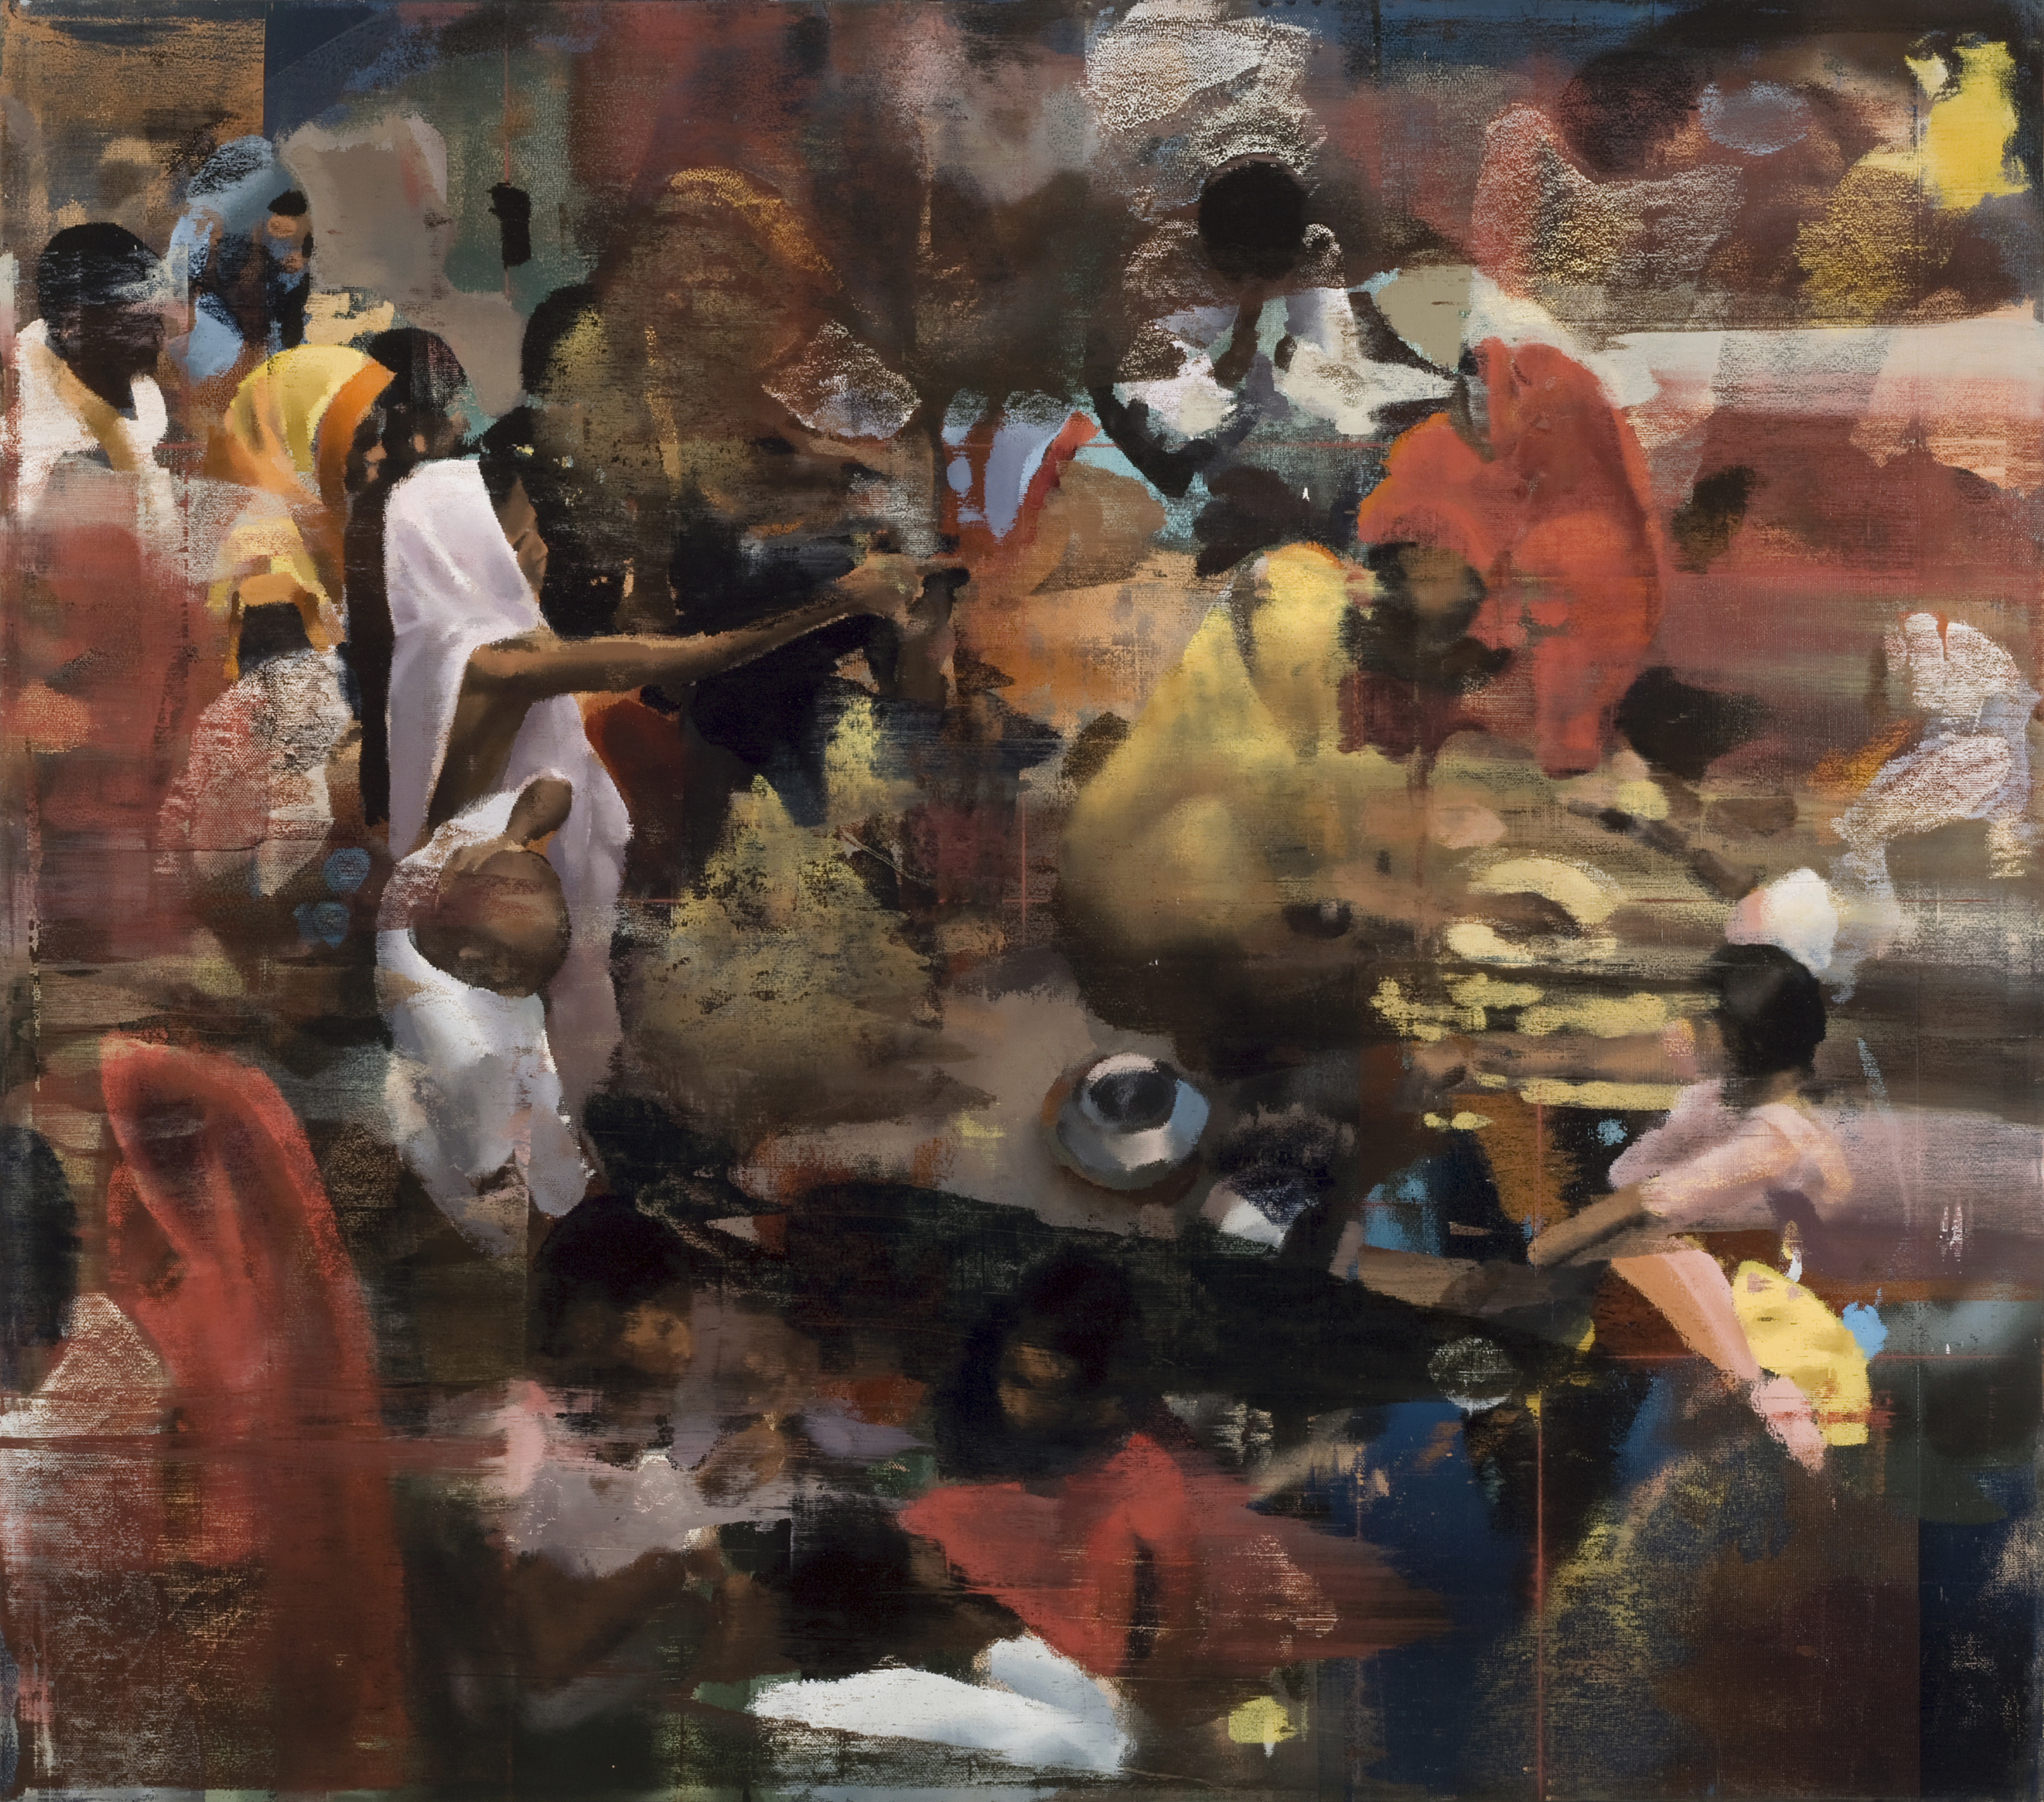 "Every Little Act, Oil on Linen on Panel, 2008, 60"" x 68"""